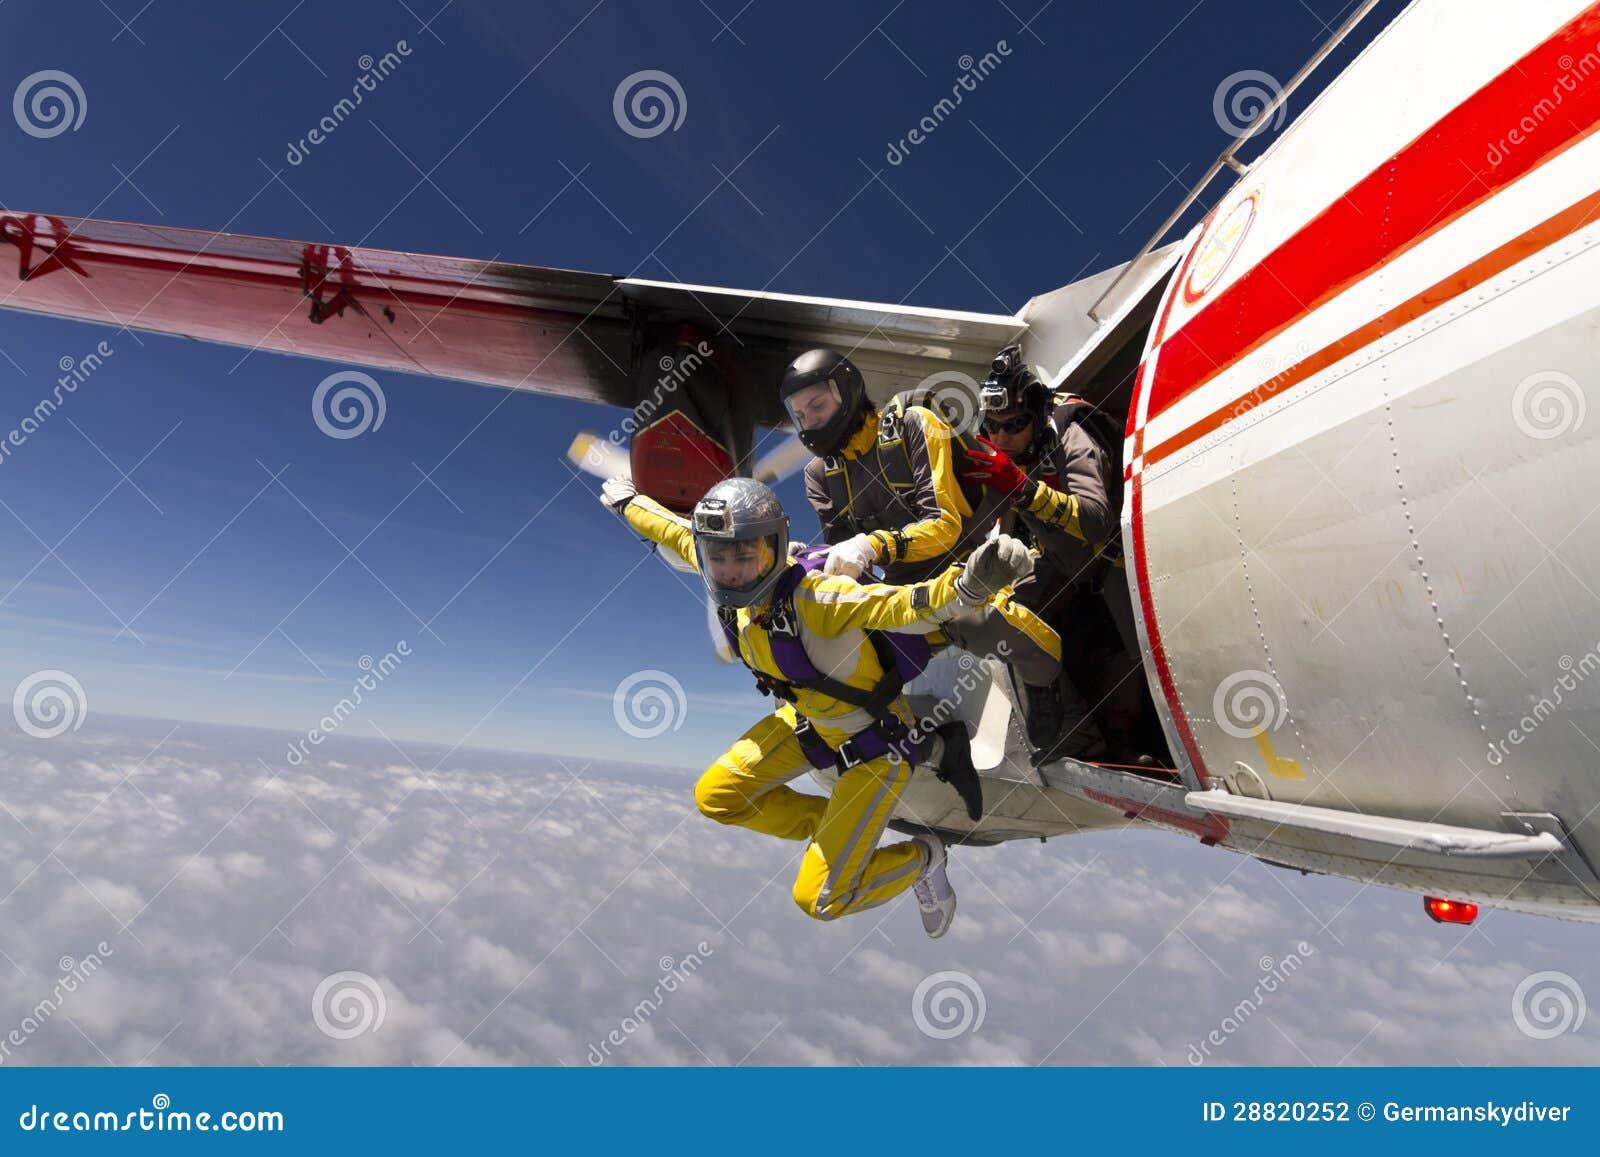 Skydiving Foto.